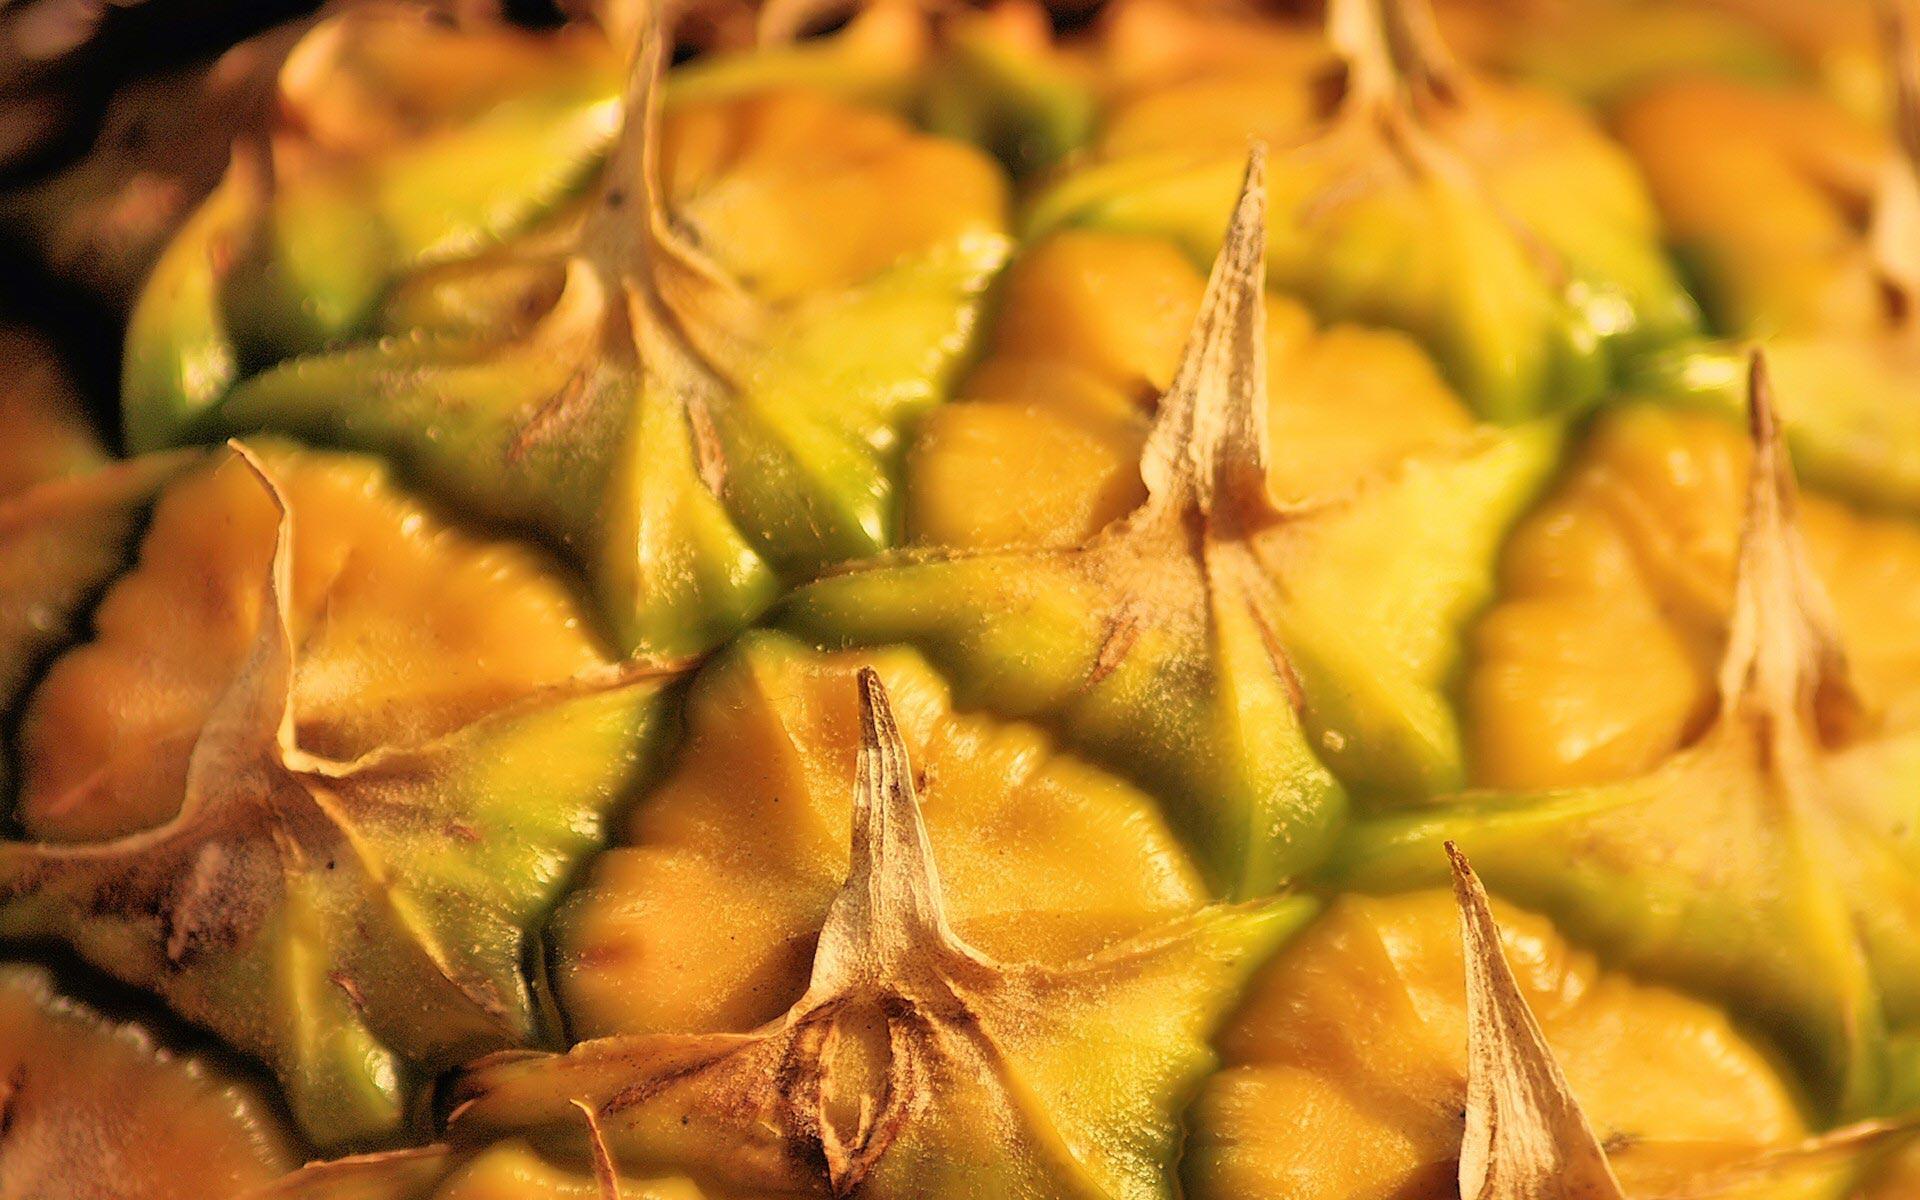 25 Pineapple HD Wallpapers